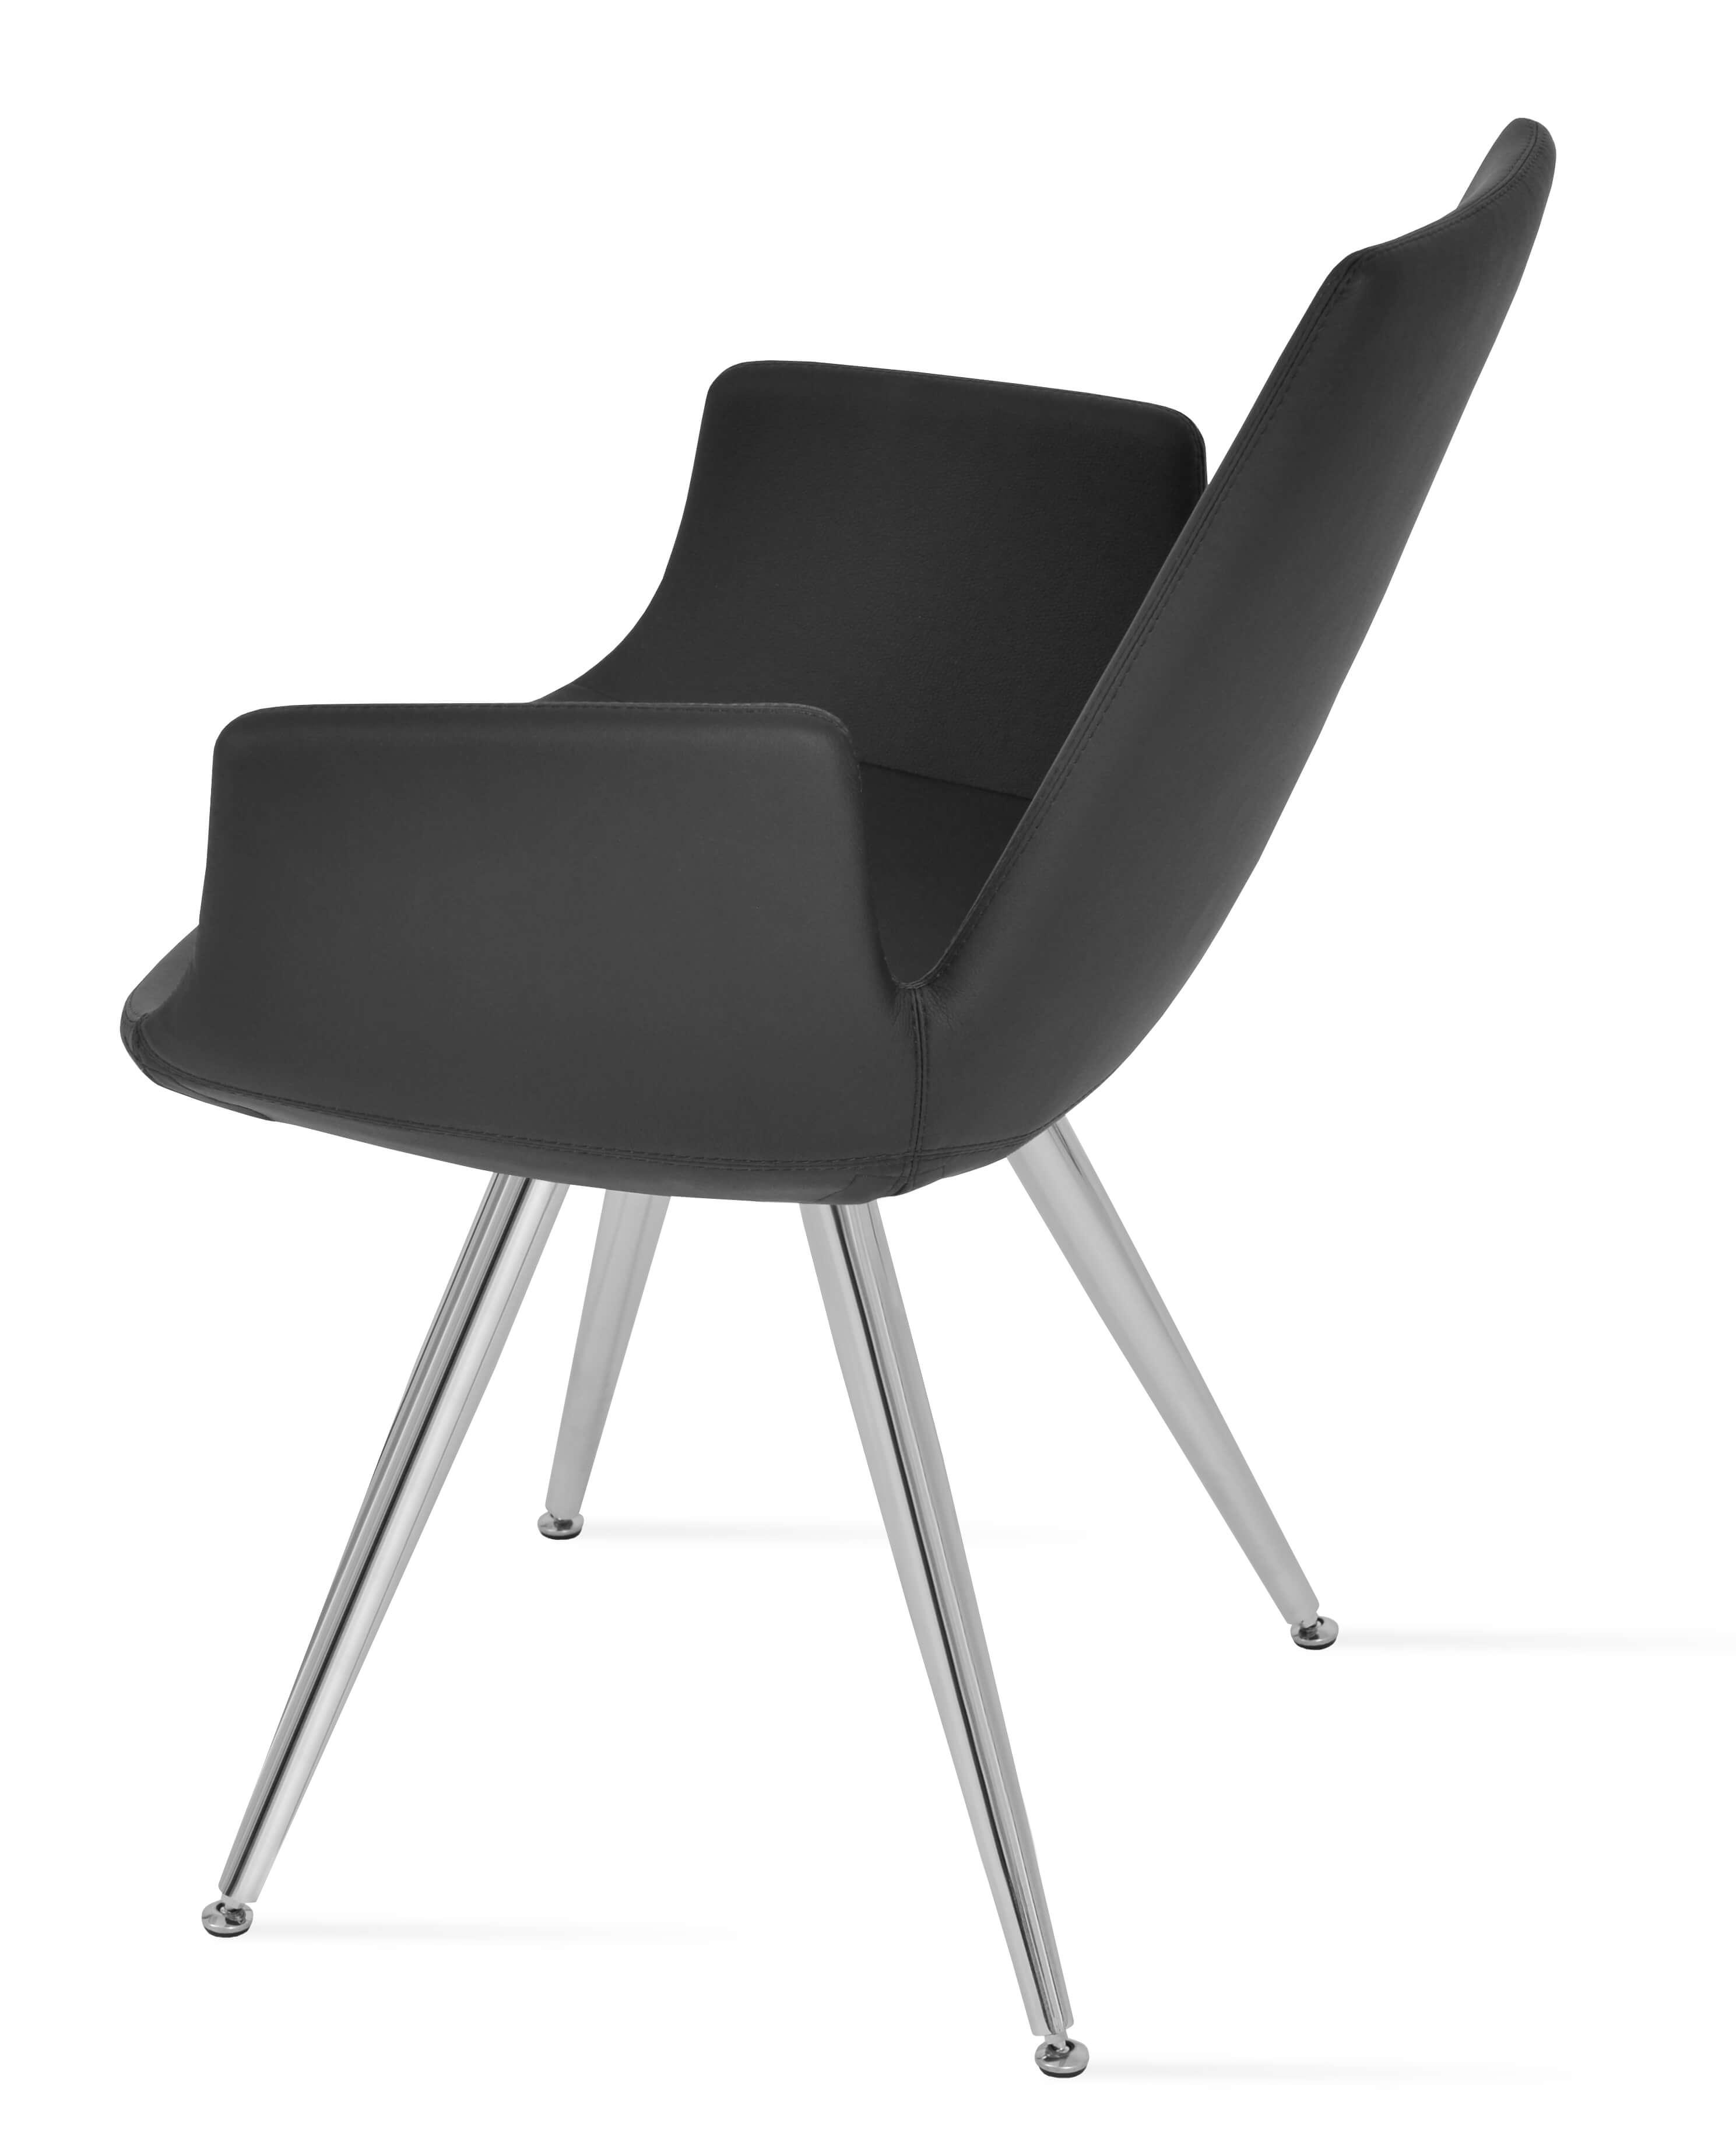 steel chair leg caps metoo portable high eiffel arm star stainless white ppm